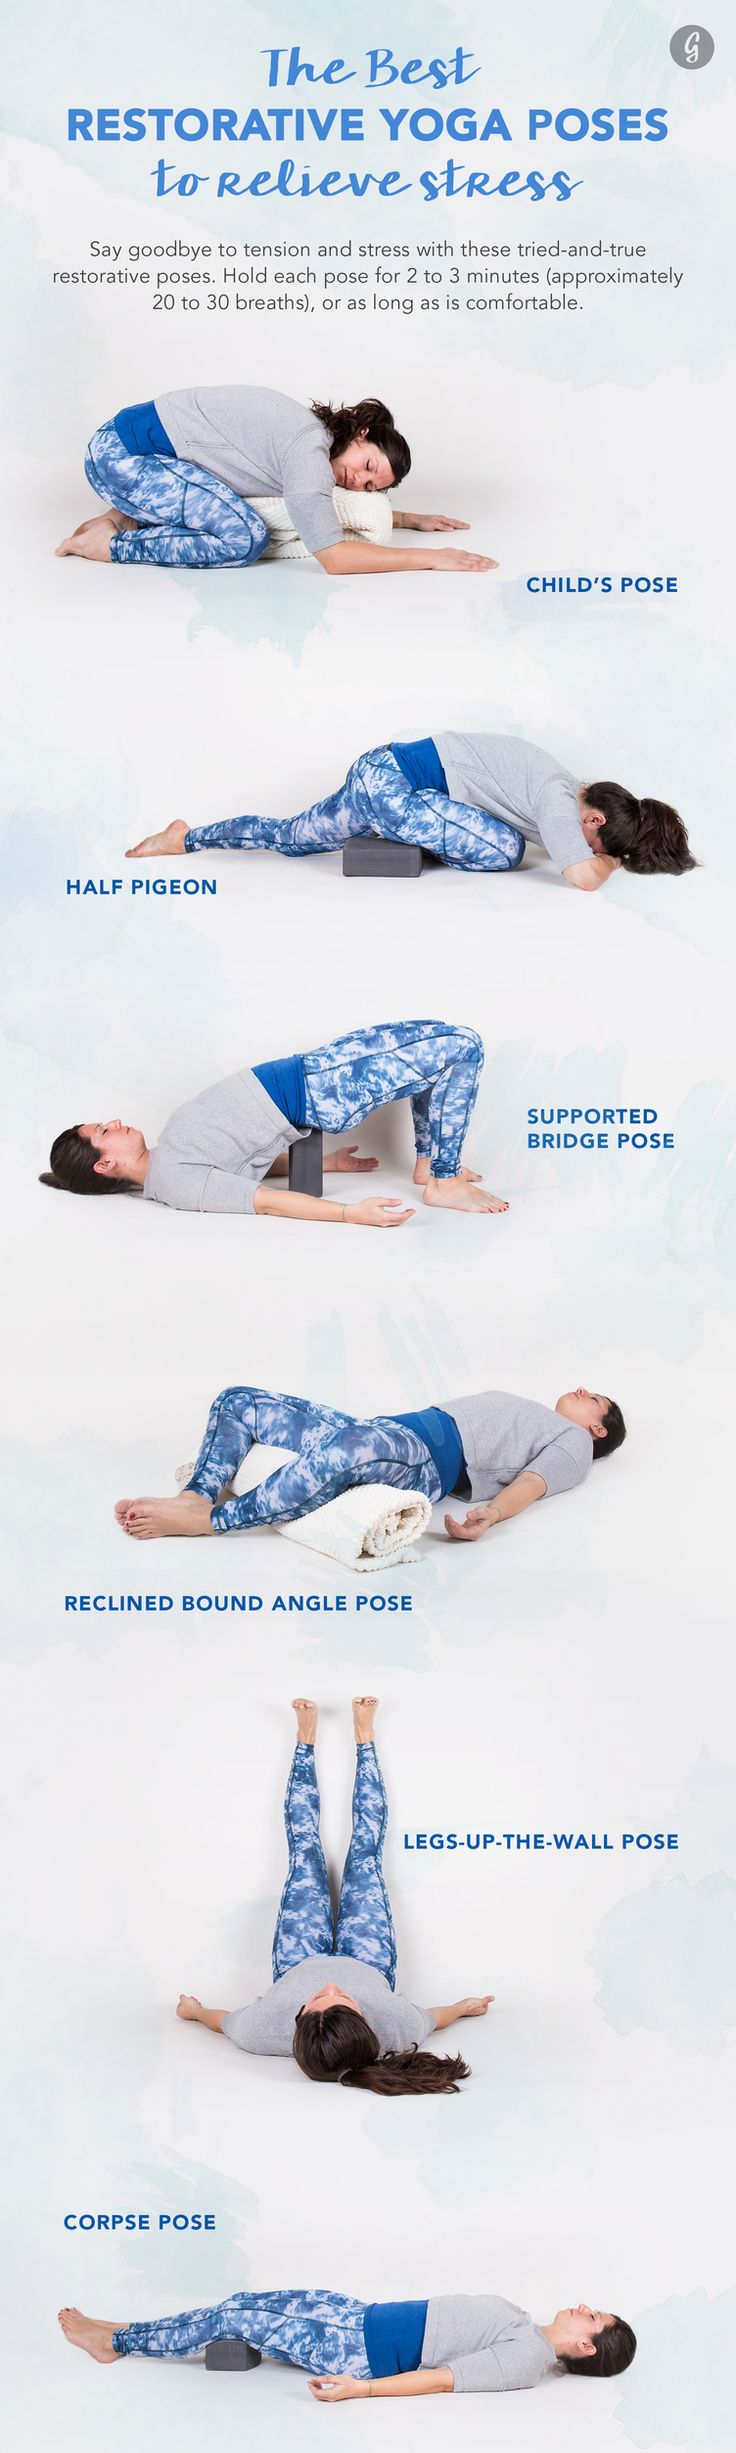 Restorative Yoga Graphic